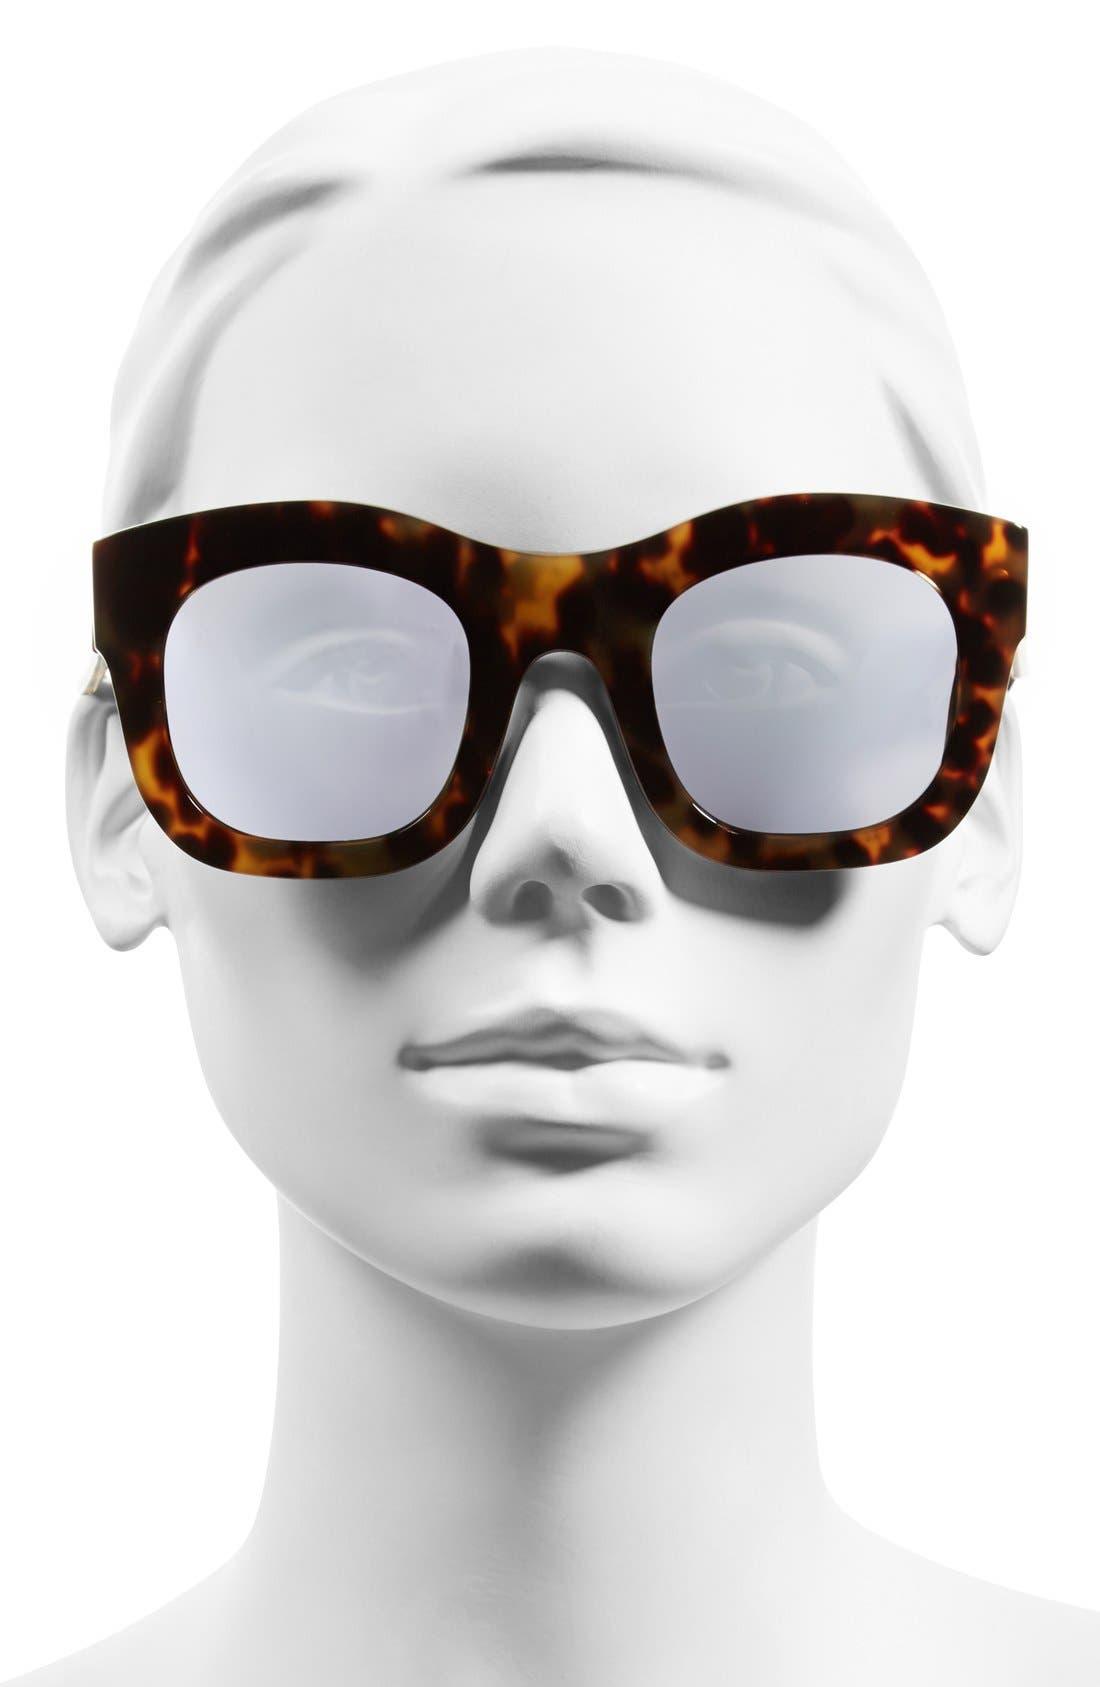 'Hamilton' 49mm Retro Sunglasses,                             Alternate thumbnail 17, color,